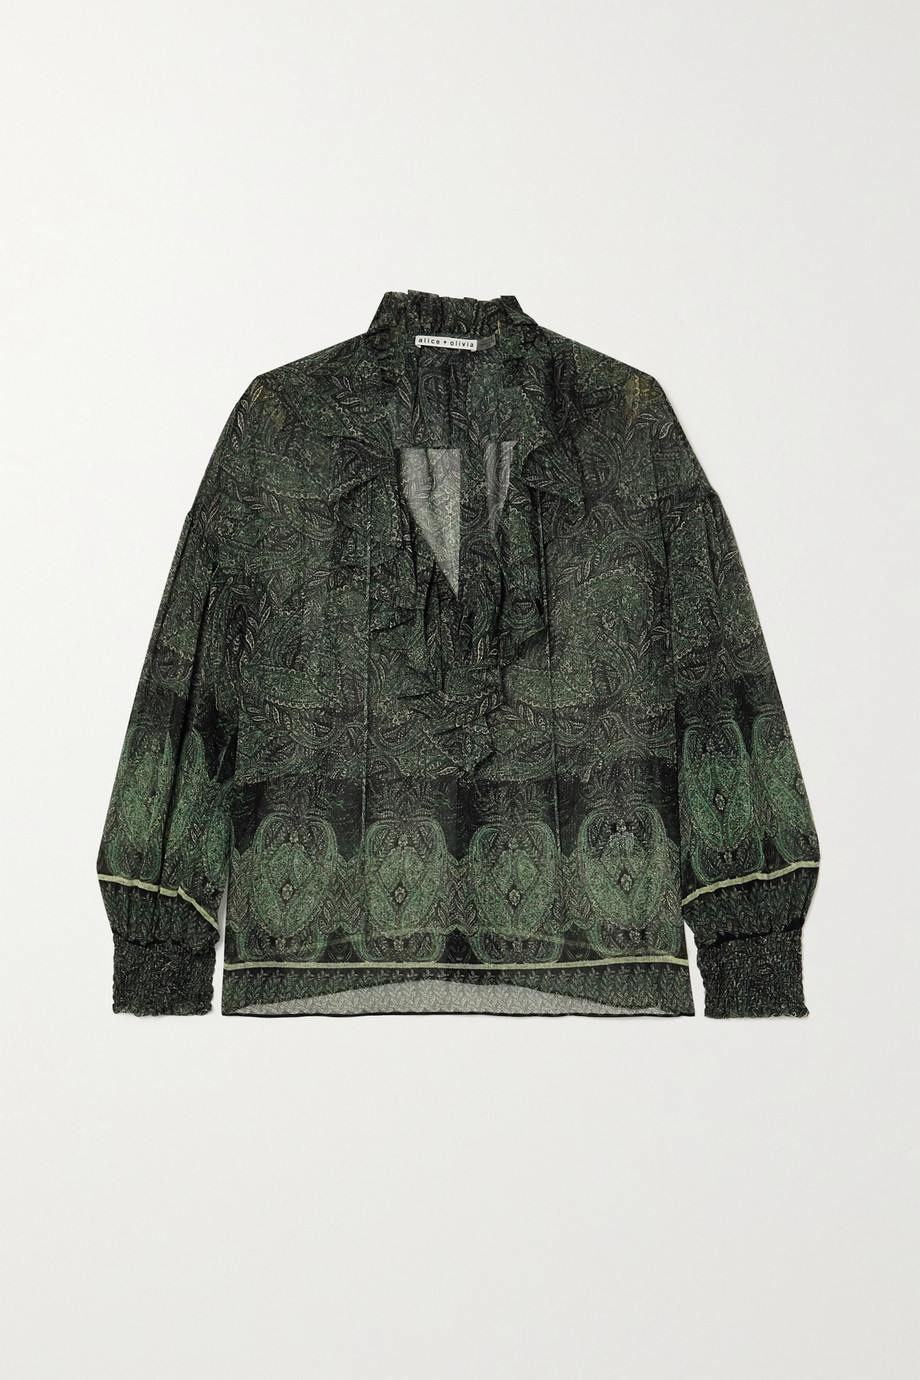 Alice + Olivia Julius ruffled paisley-print chiffon blouse